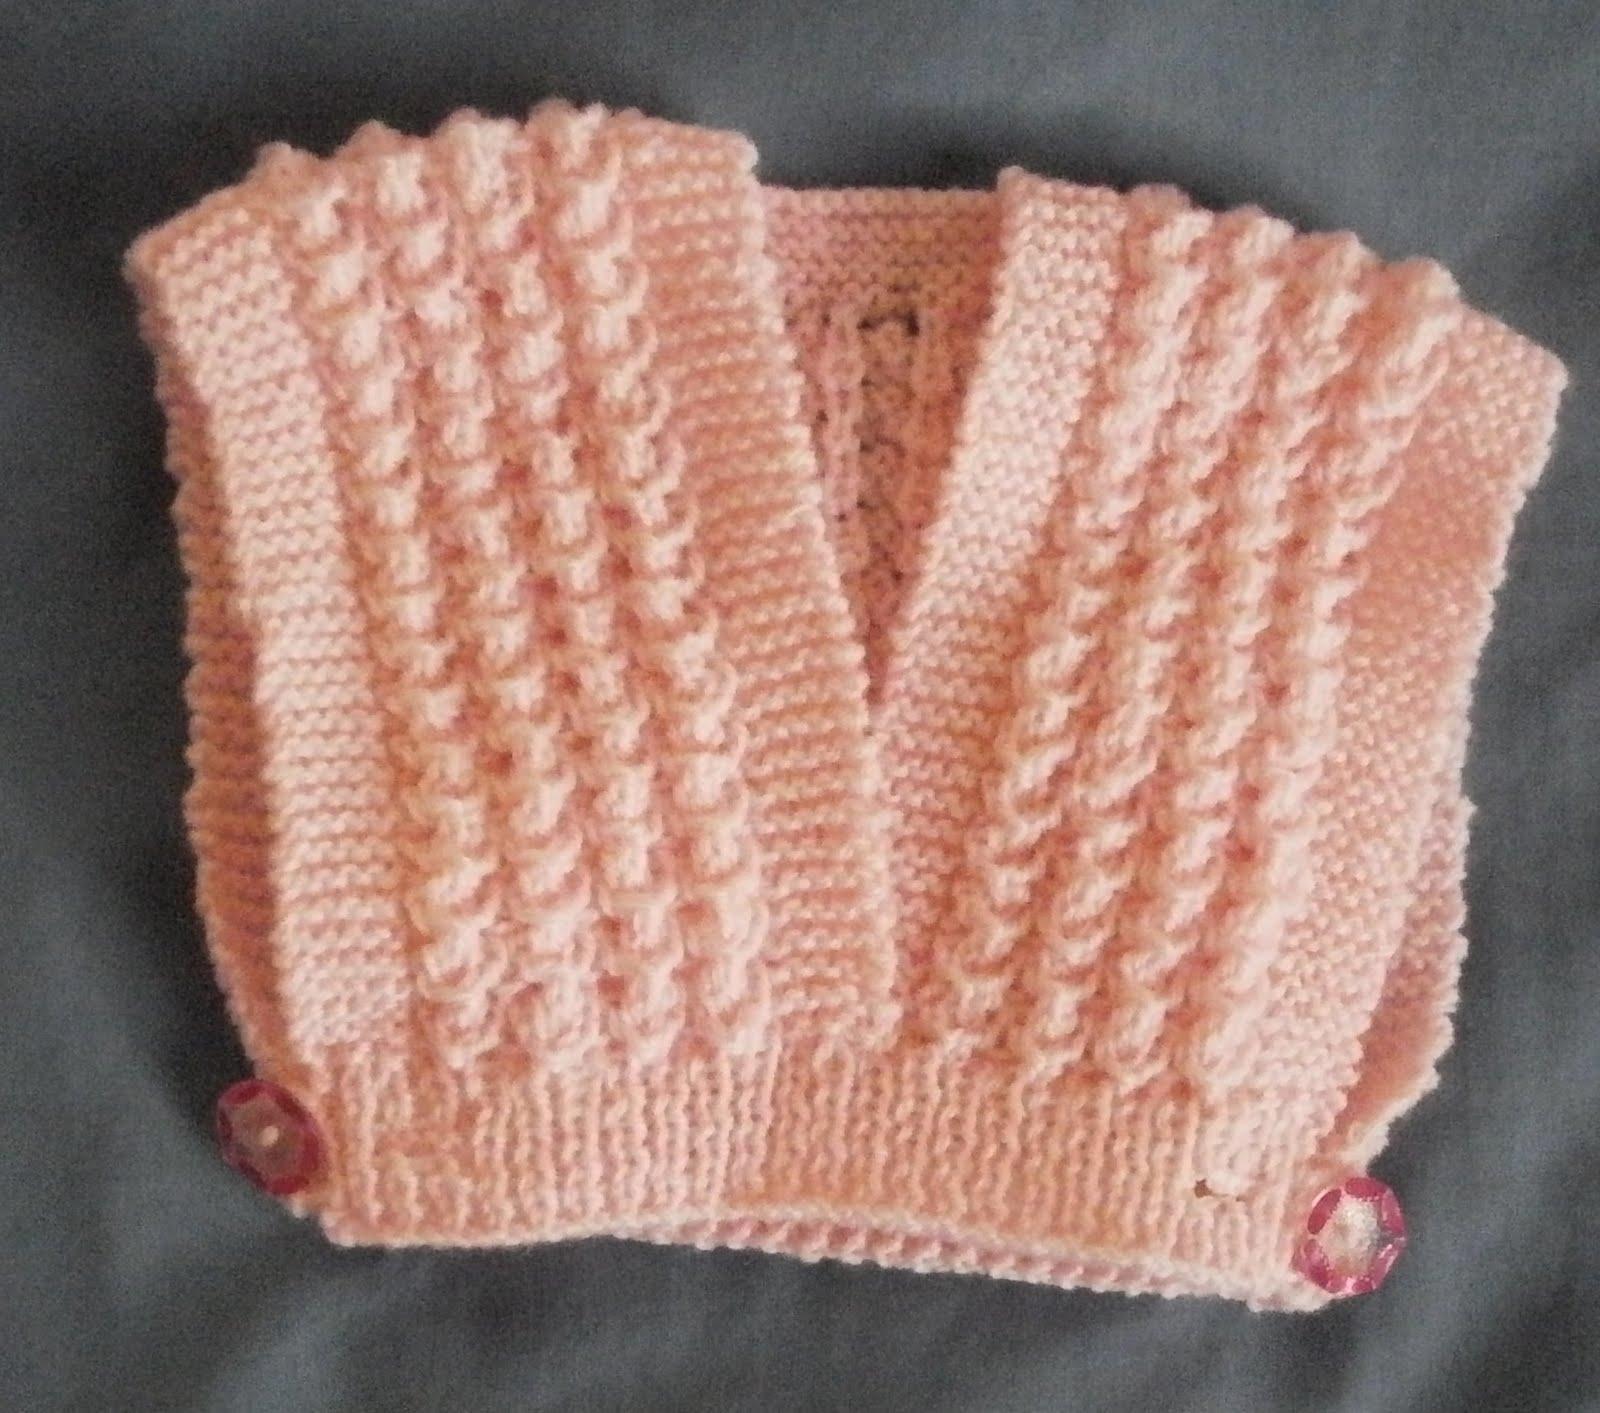 256f6c4ad25 Points fantaisie tricot aiguilles - i love tricot